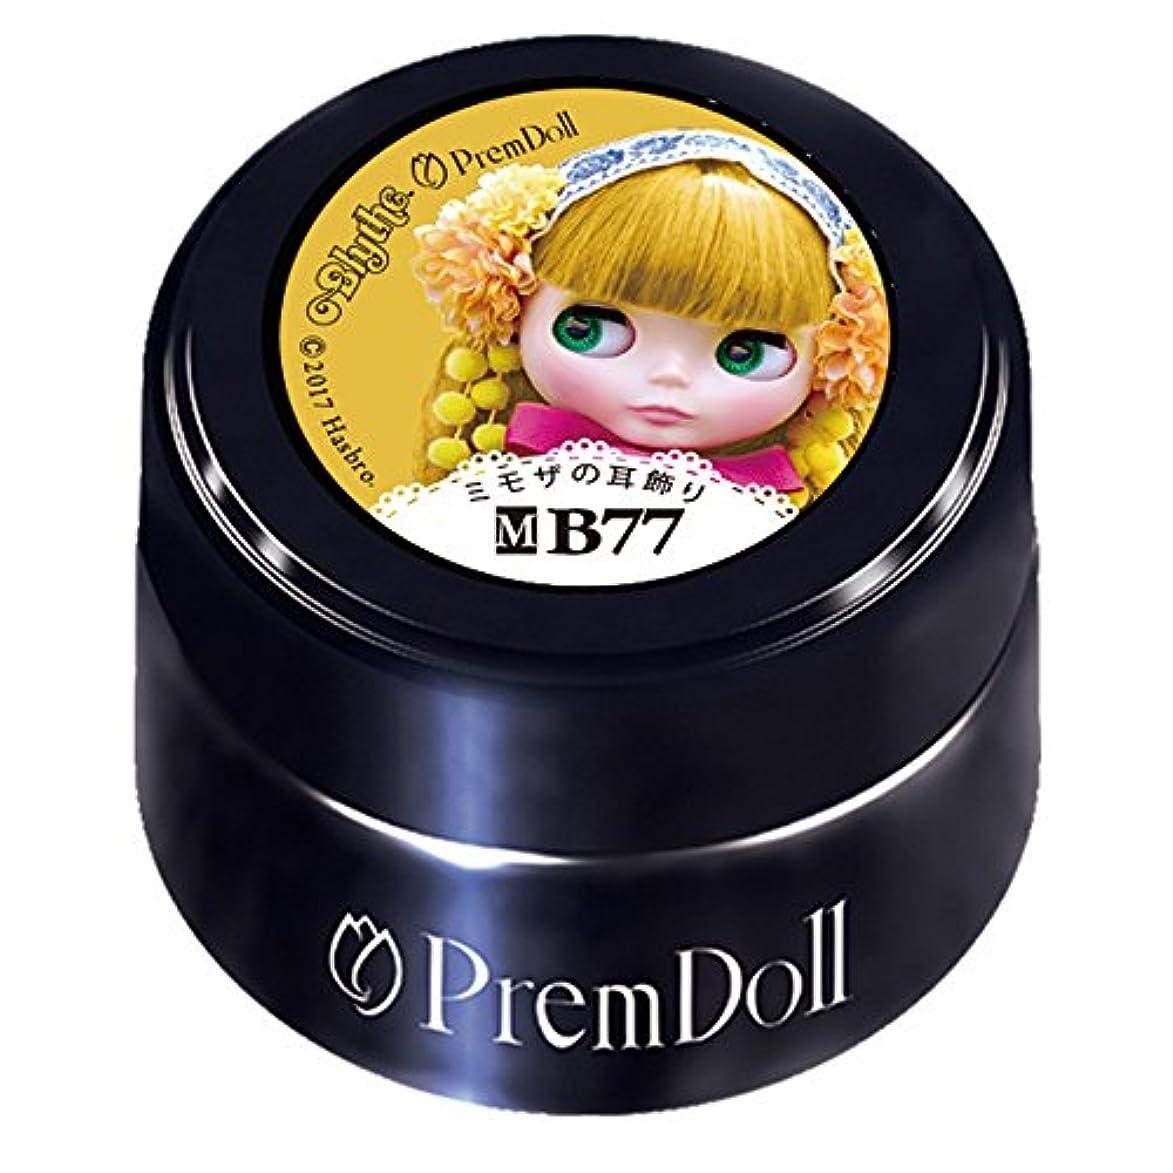 PRE GEL プリムドール ミモザの首飾り DOLL-B77 3g UV/LED対応 カラージェル